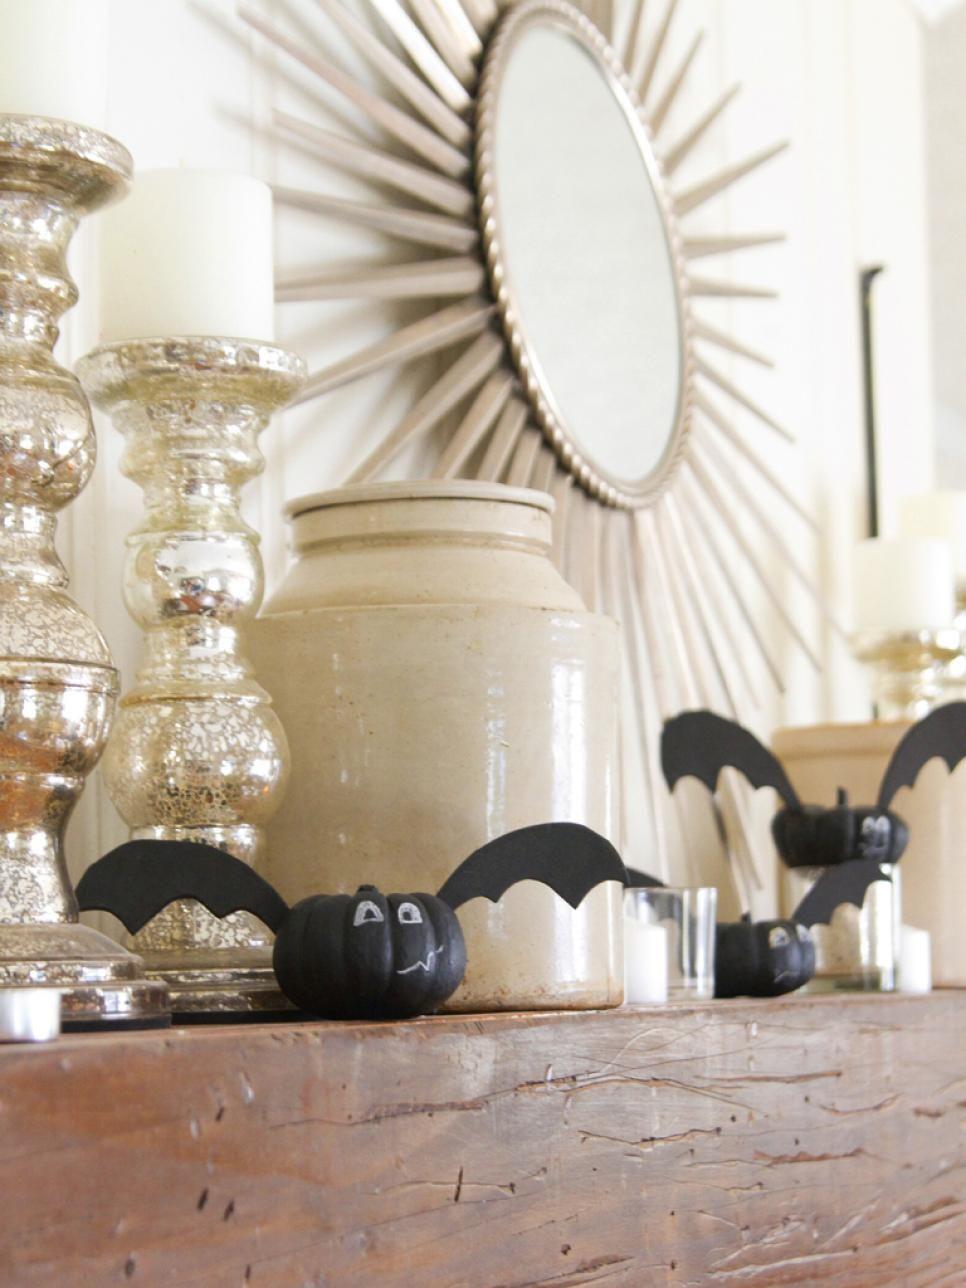 60 diy halloween decorations decorating ideas - Hgtv Halloween Decorations